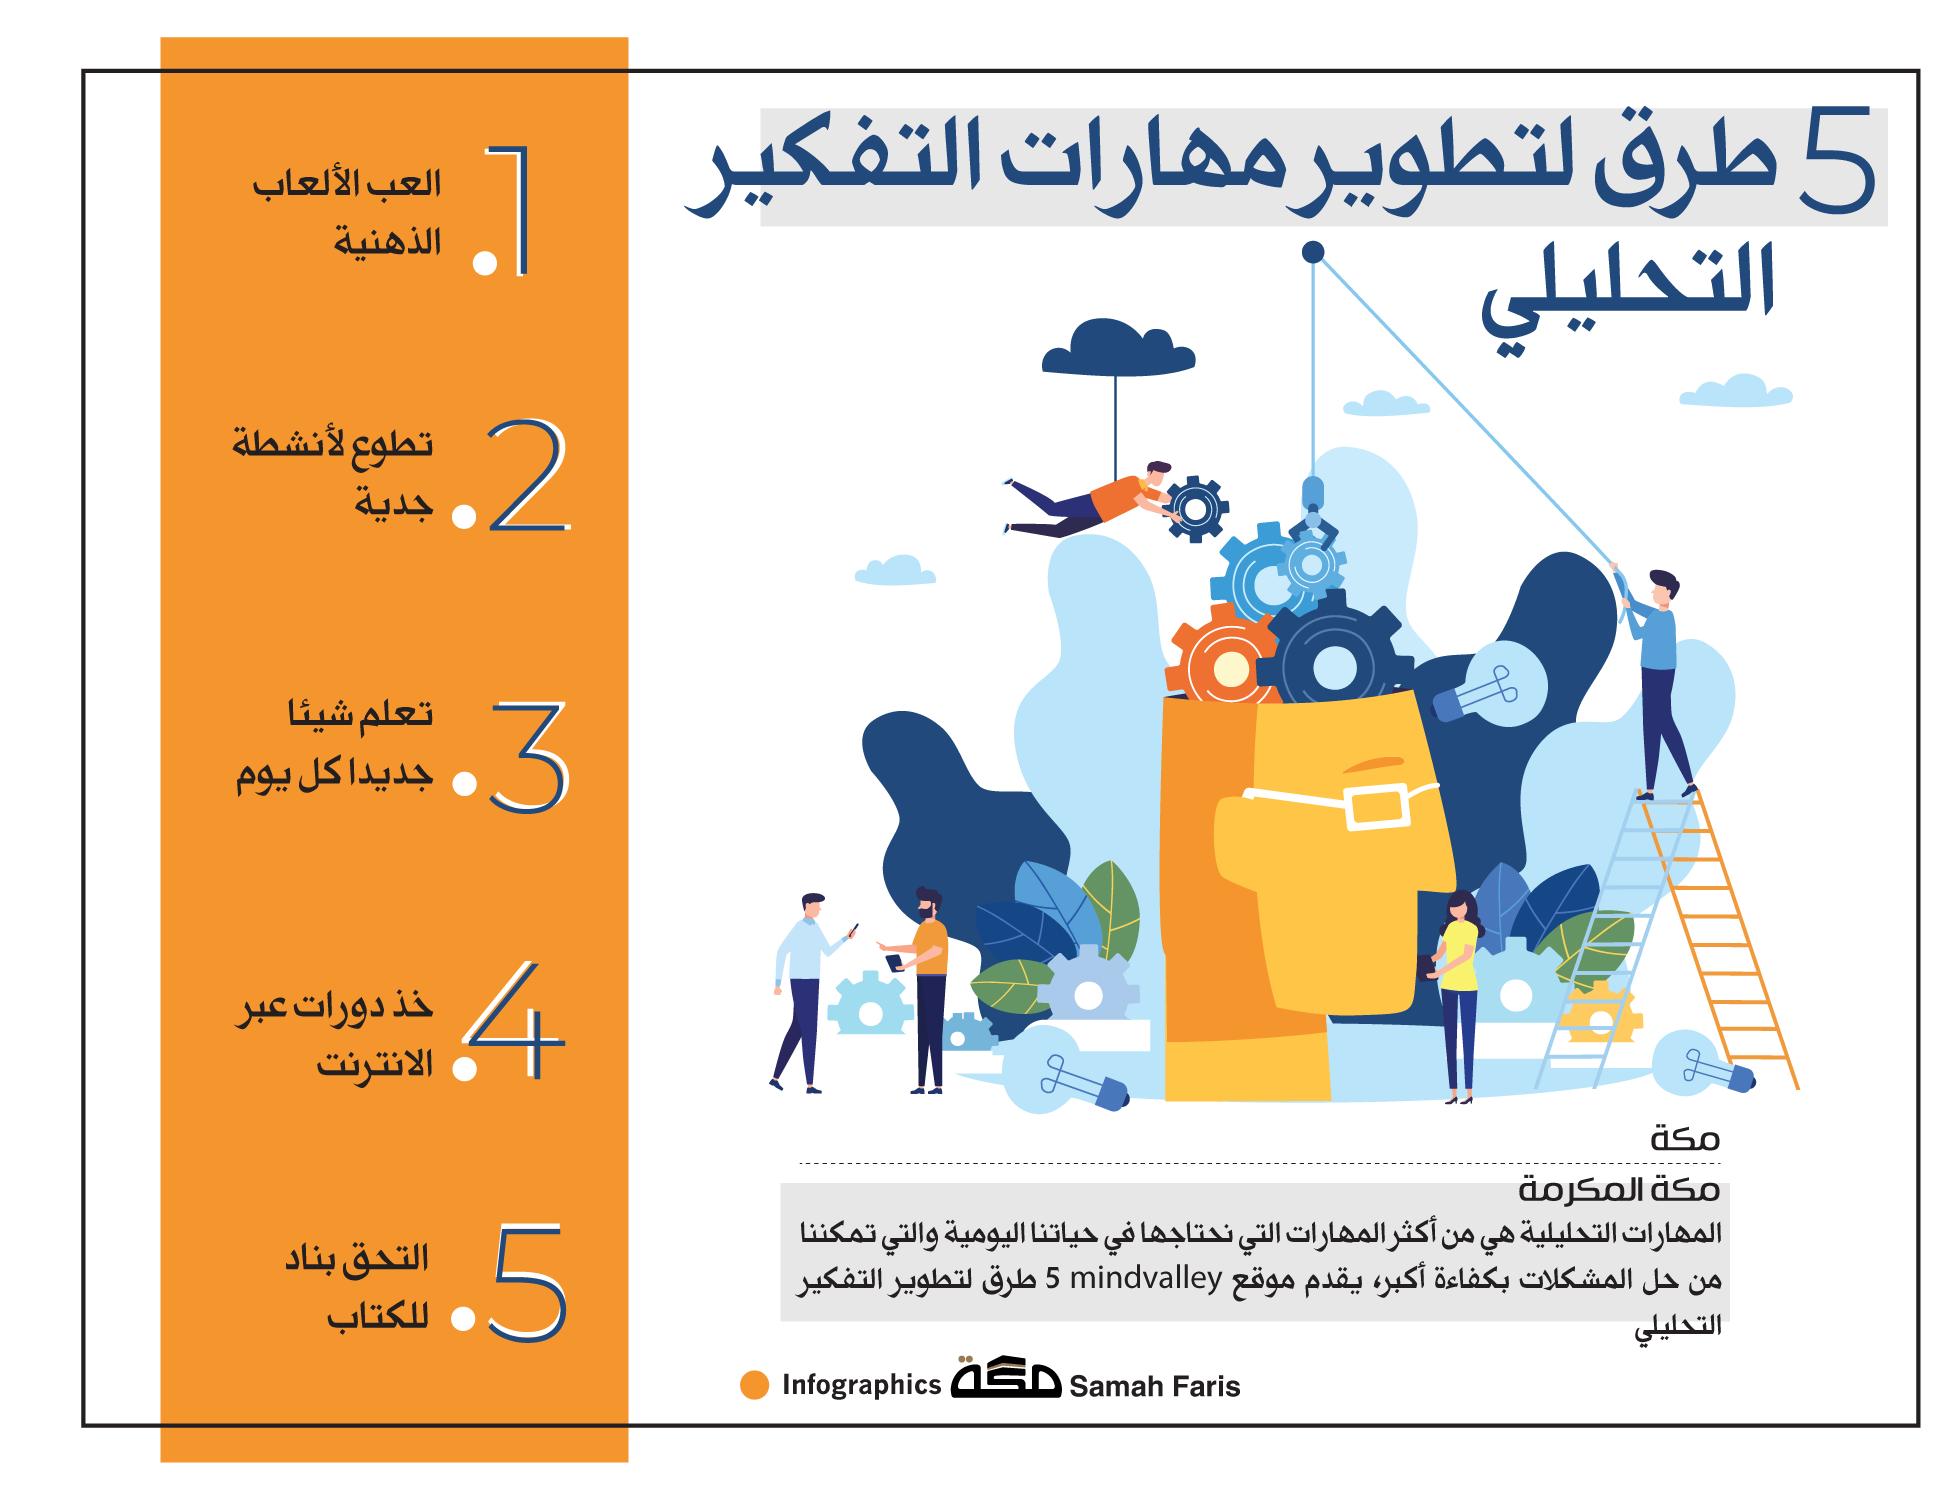 5 طرق لتطوير مهارات التفكير التحليلي التفكير التحليلي انفوجرافيك صحيفة مكة Programming Apps Free Graphic Design Infographic